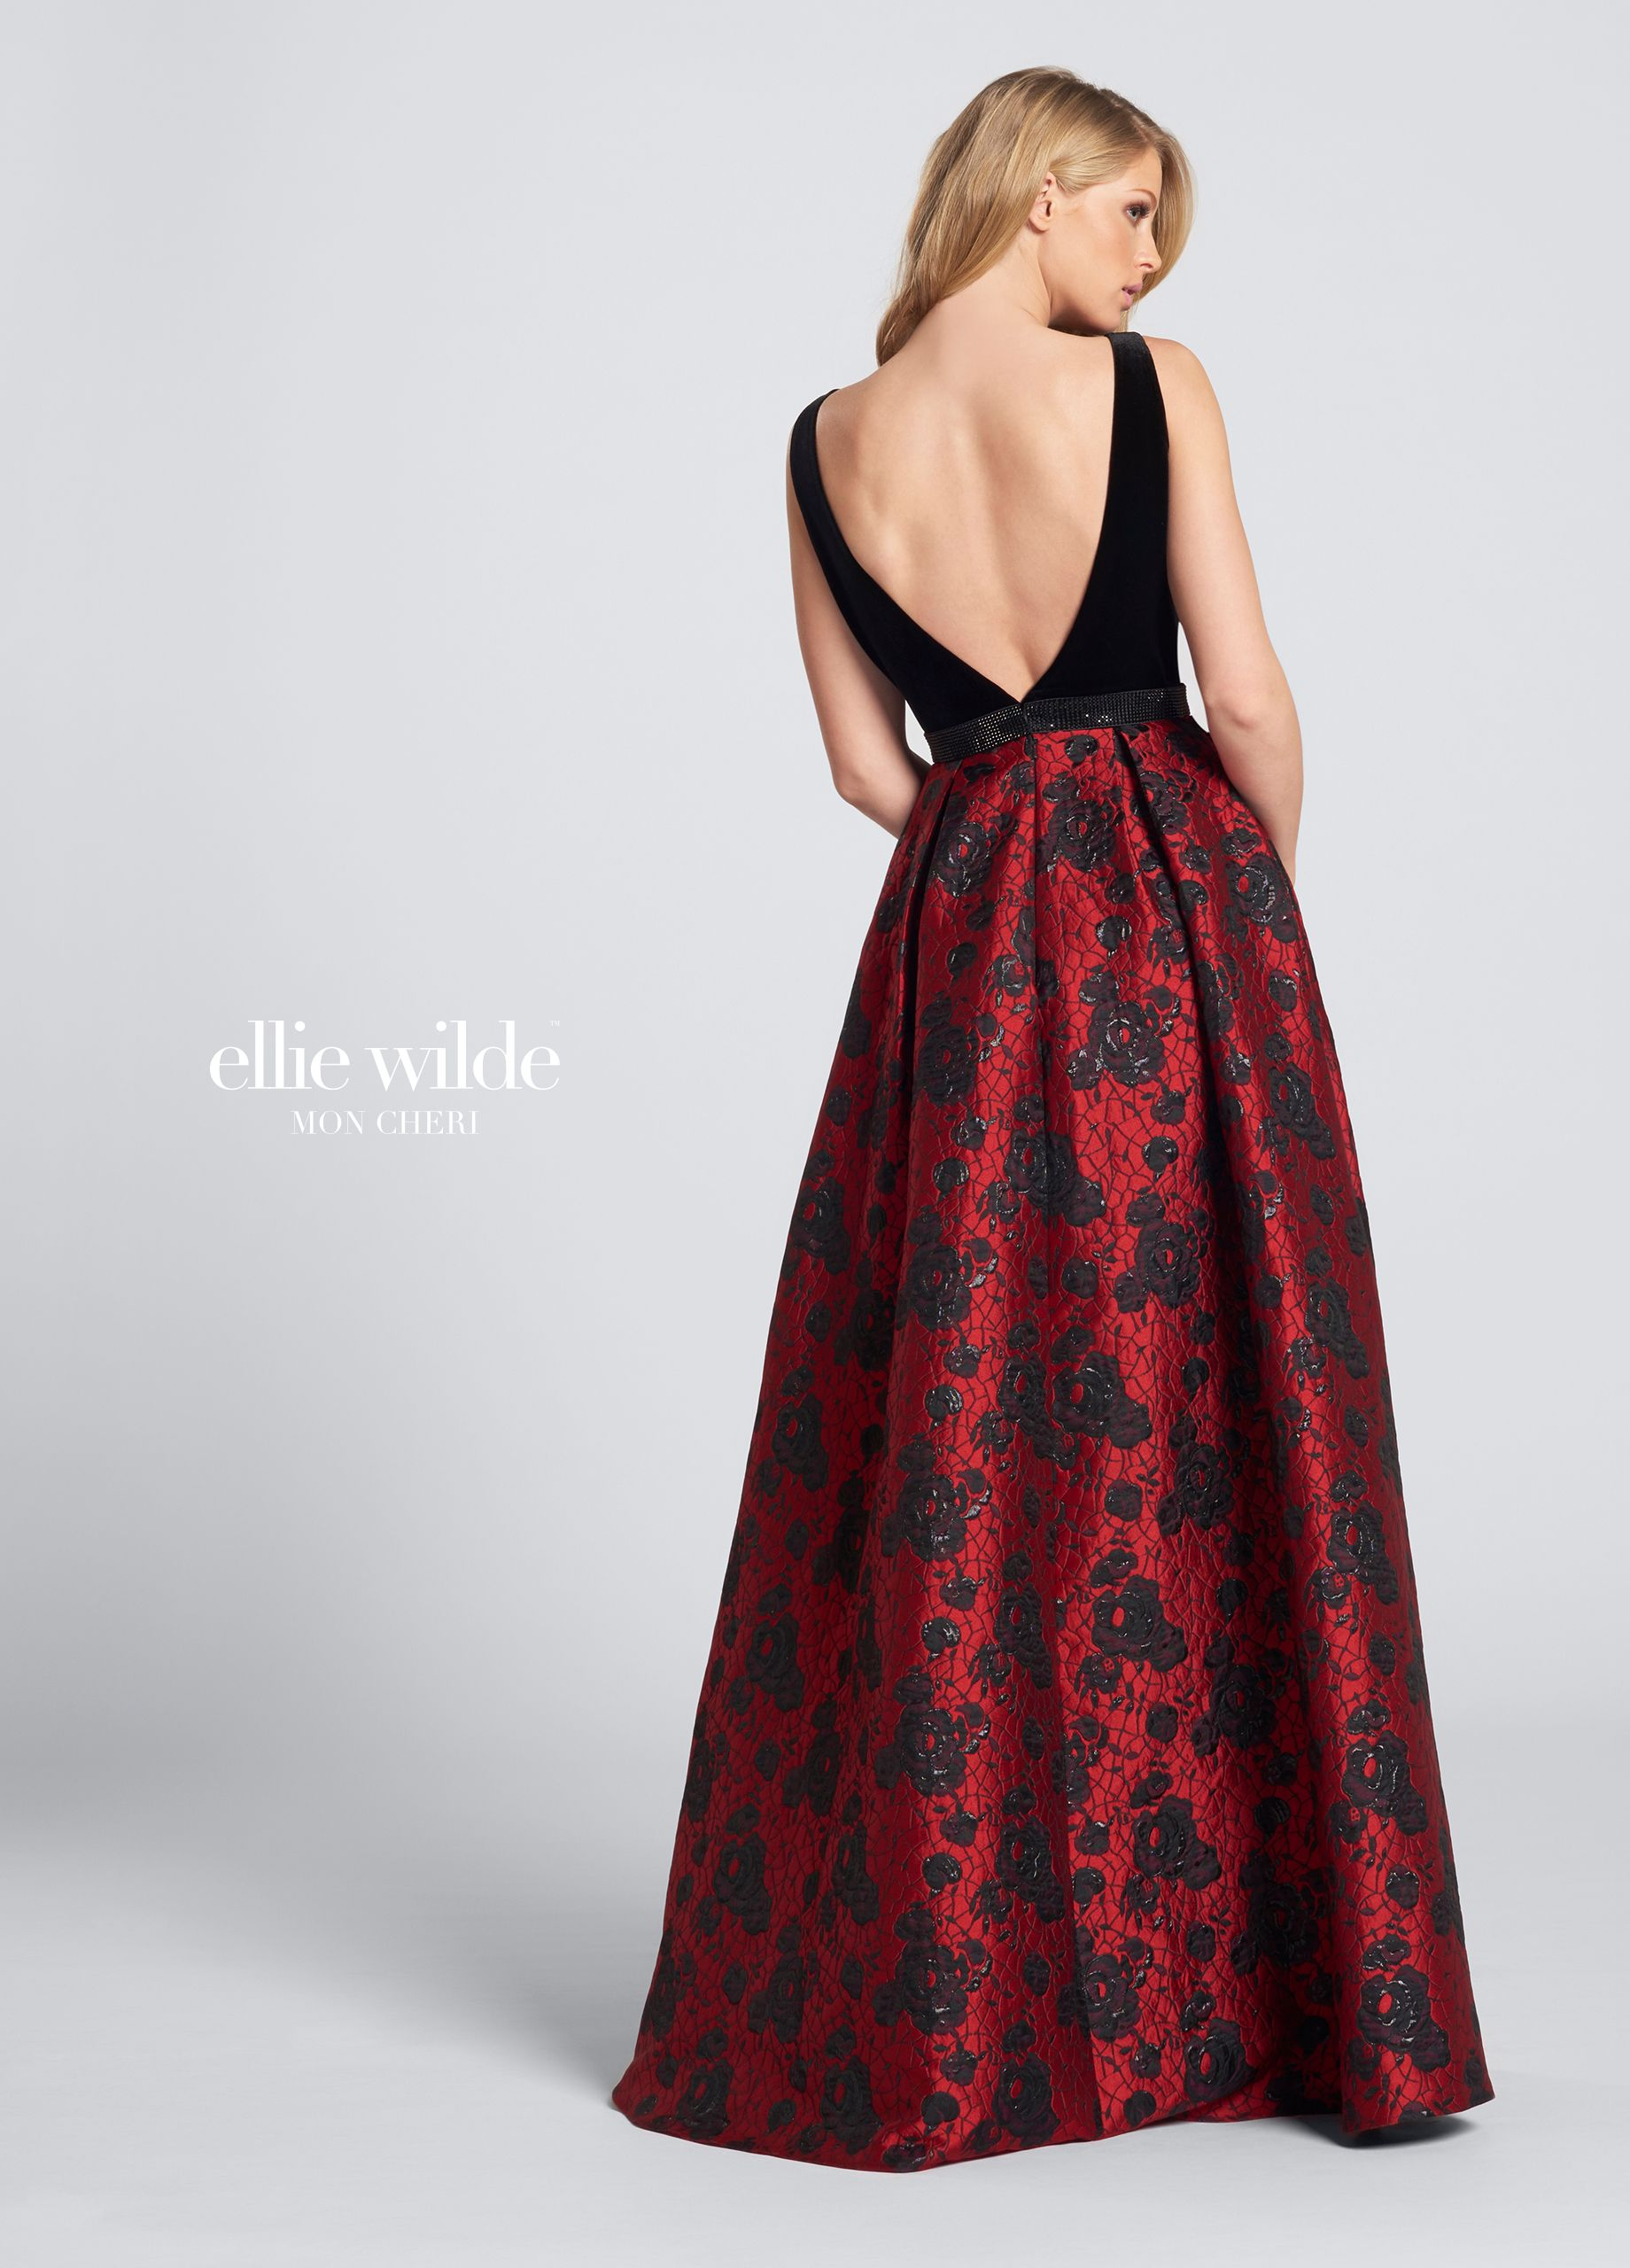 92b84bacfde5 Ellie Wilde EW21721 - Velvet bodice evening dress. Sleeveless Jacquard full  A-line gown with front and back deep V-necklines, velvet bodice with heat  set ...